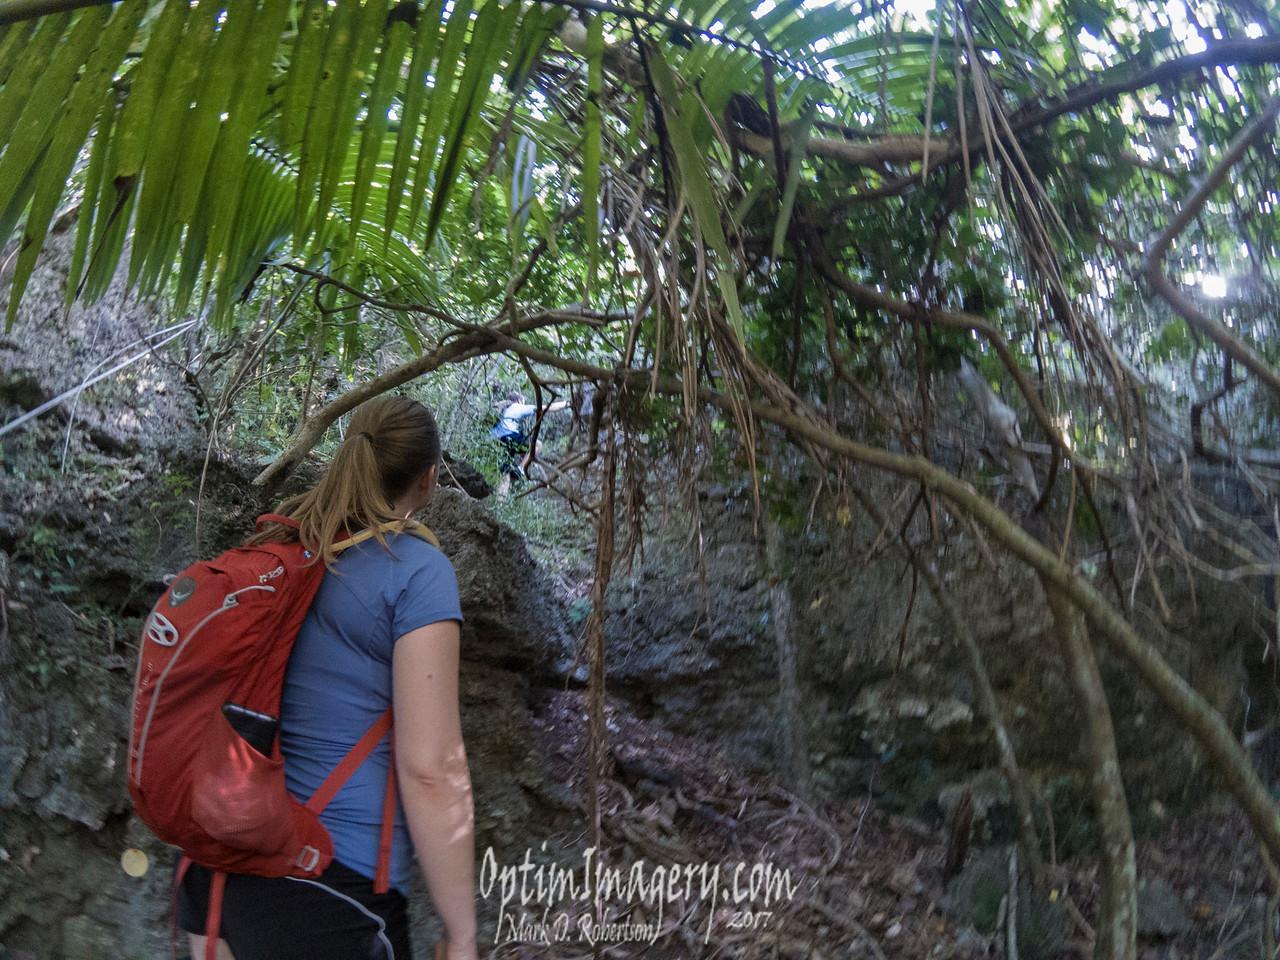 Matt explores a steep ravine.